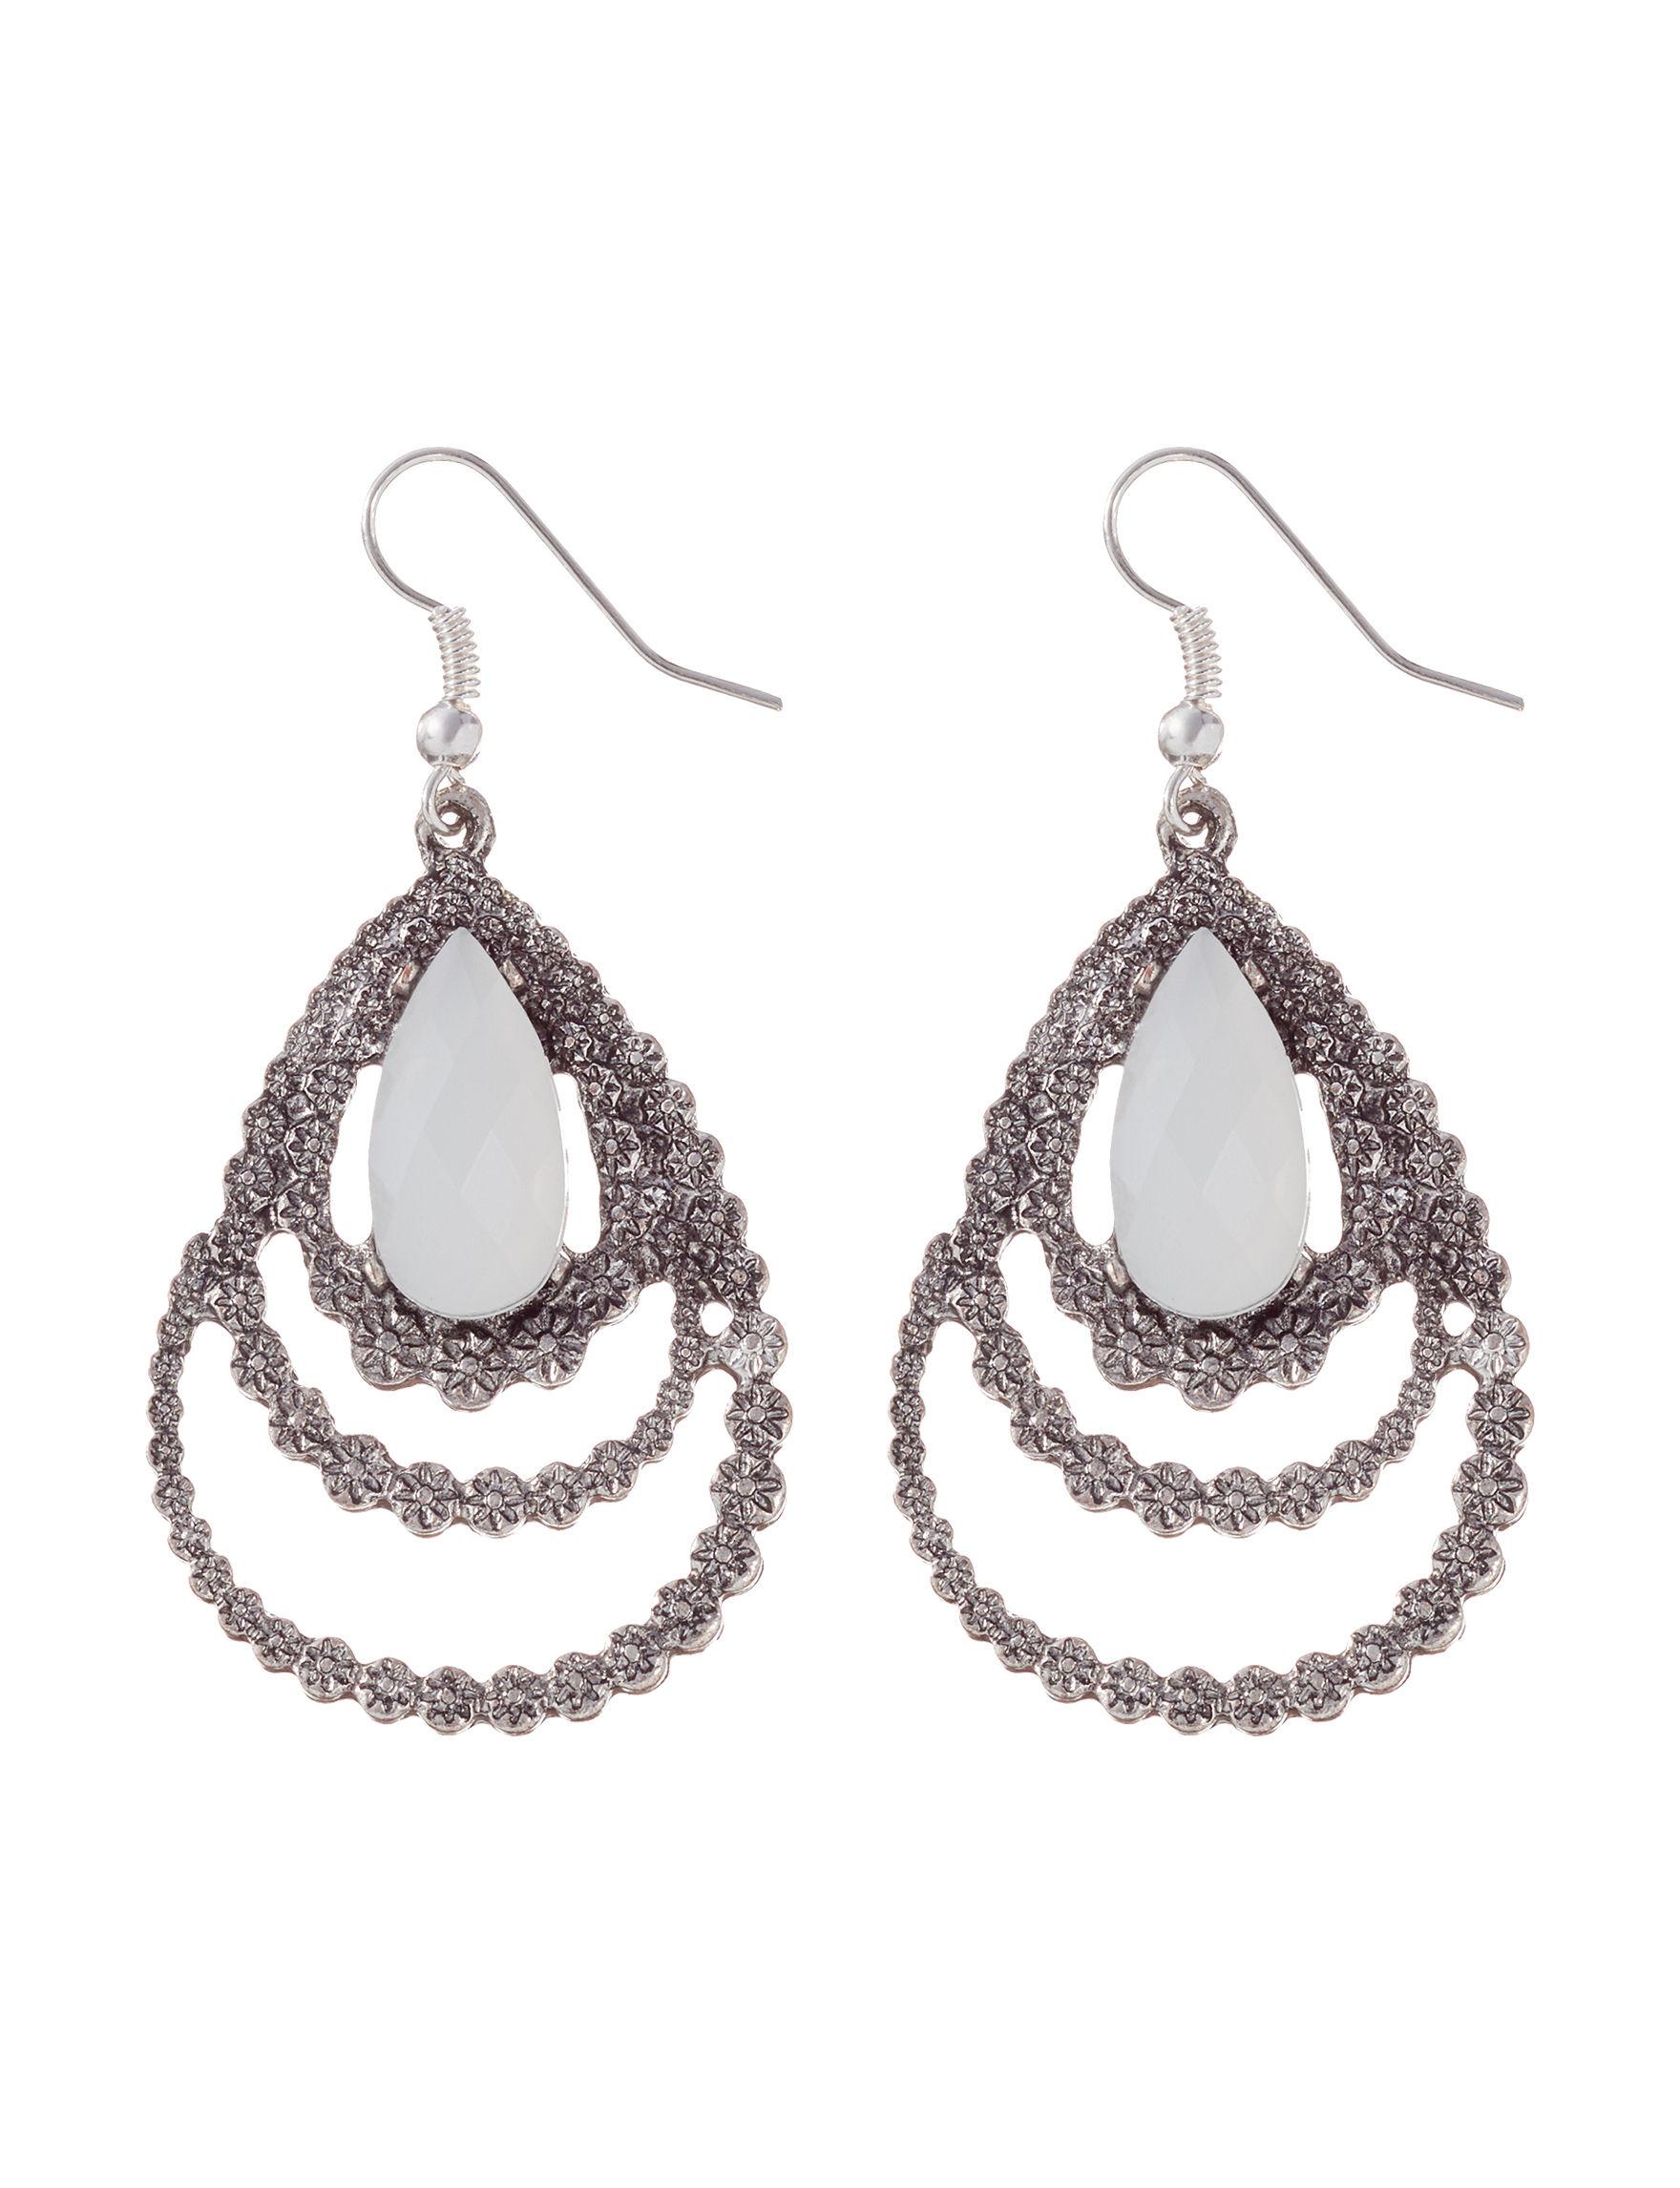 Hannah Crystal Drops Earrings Fashion Jewelry